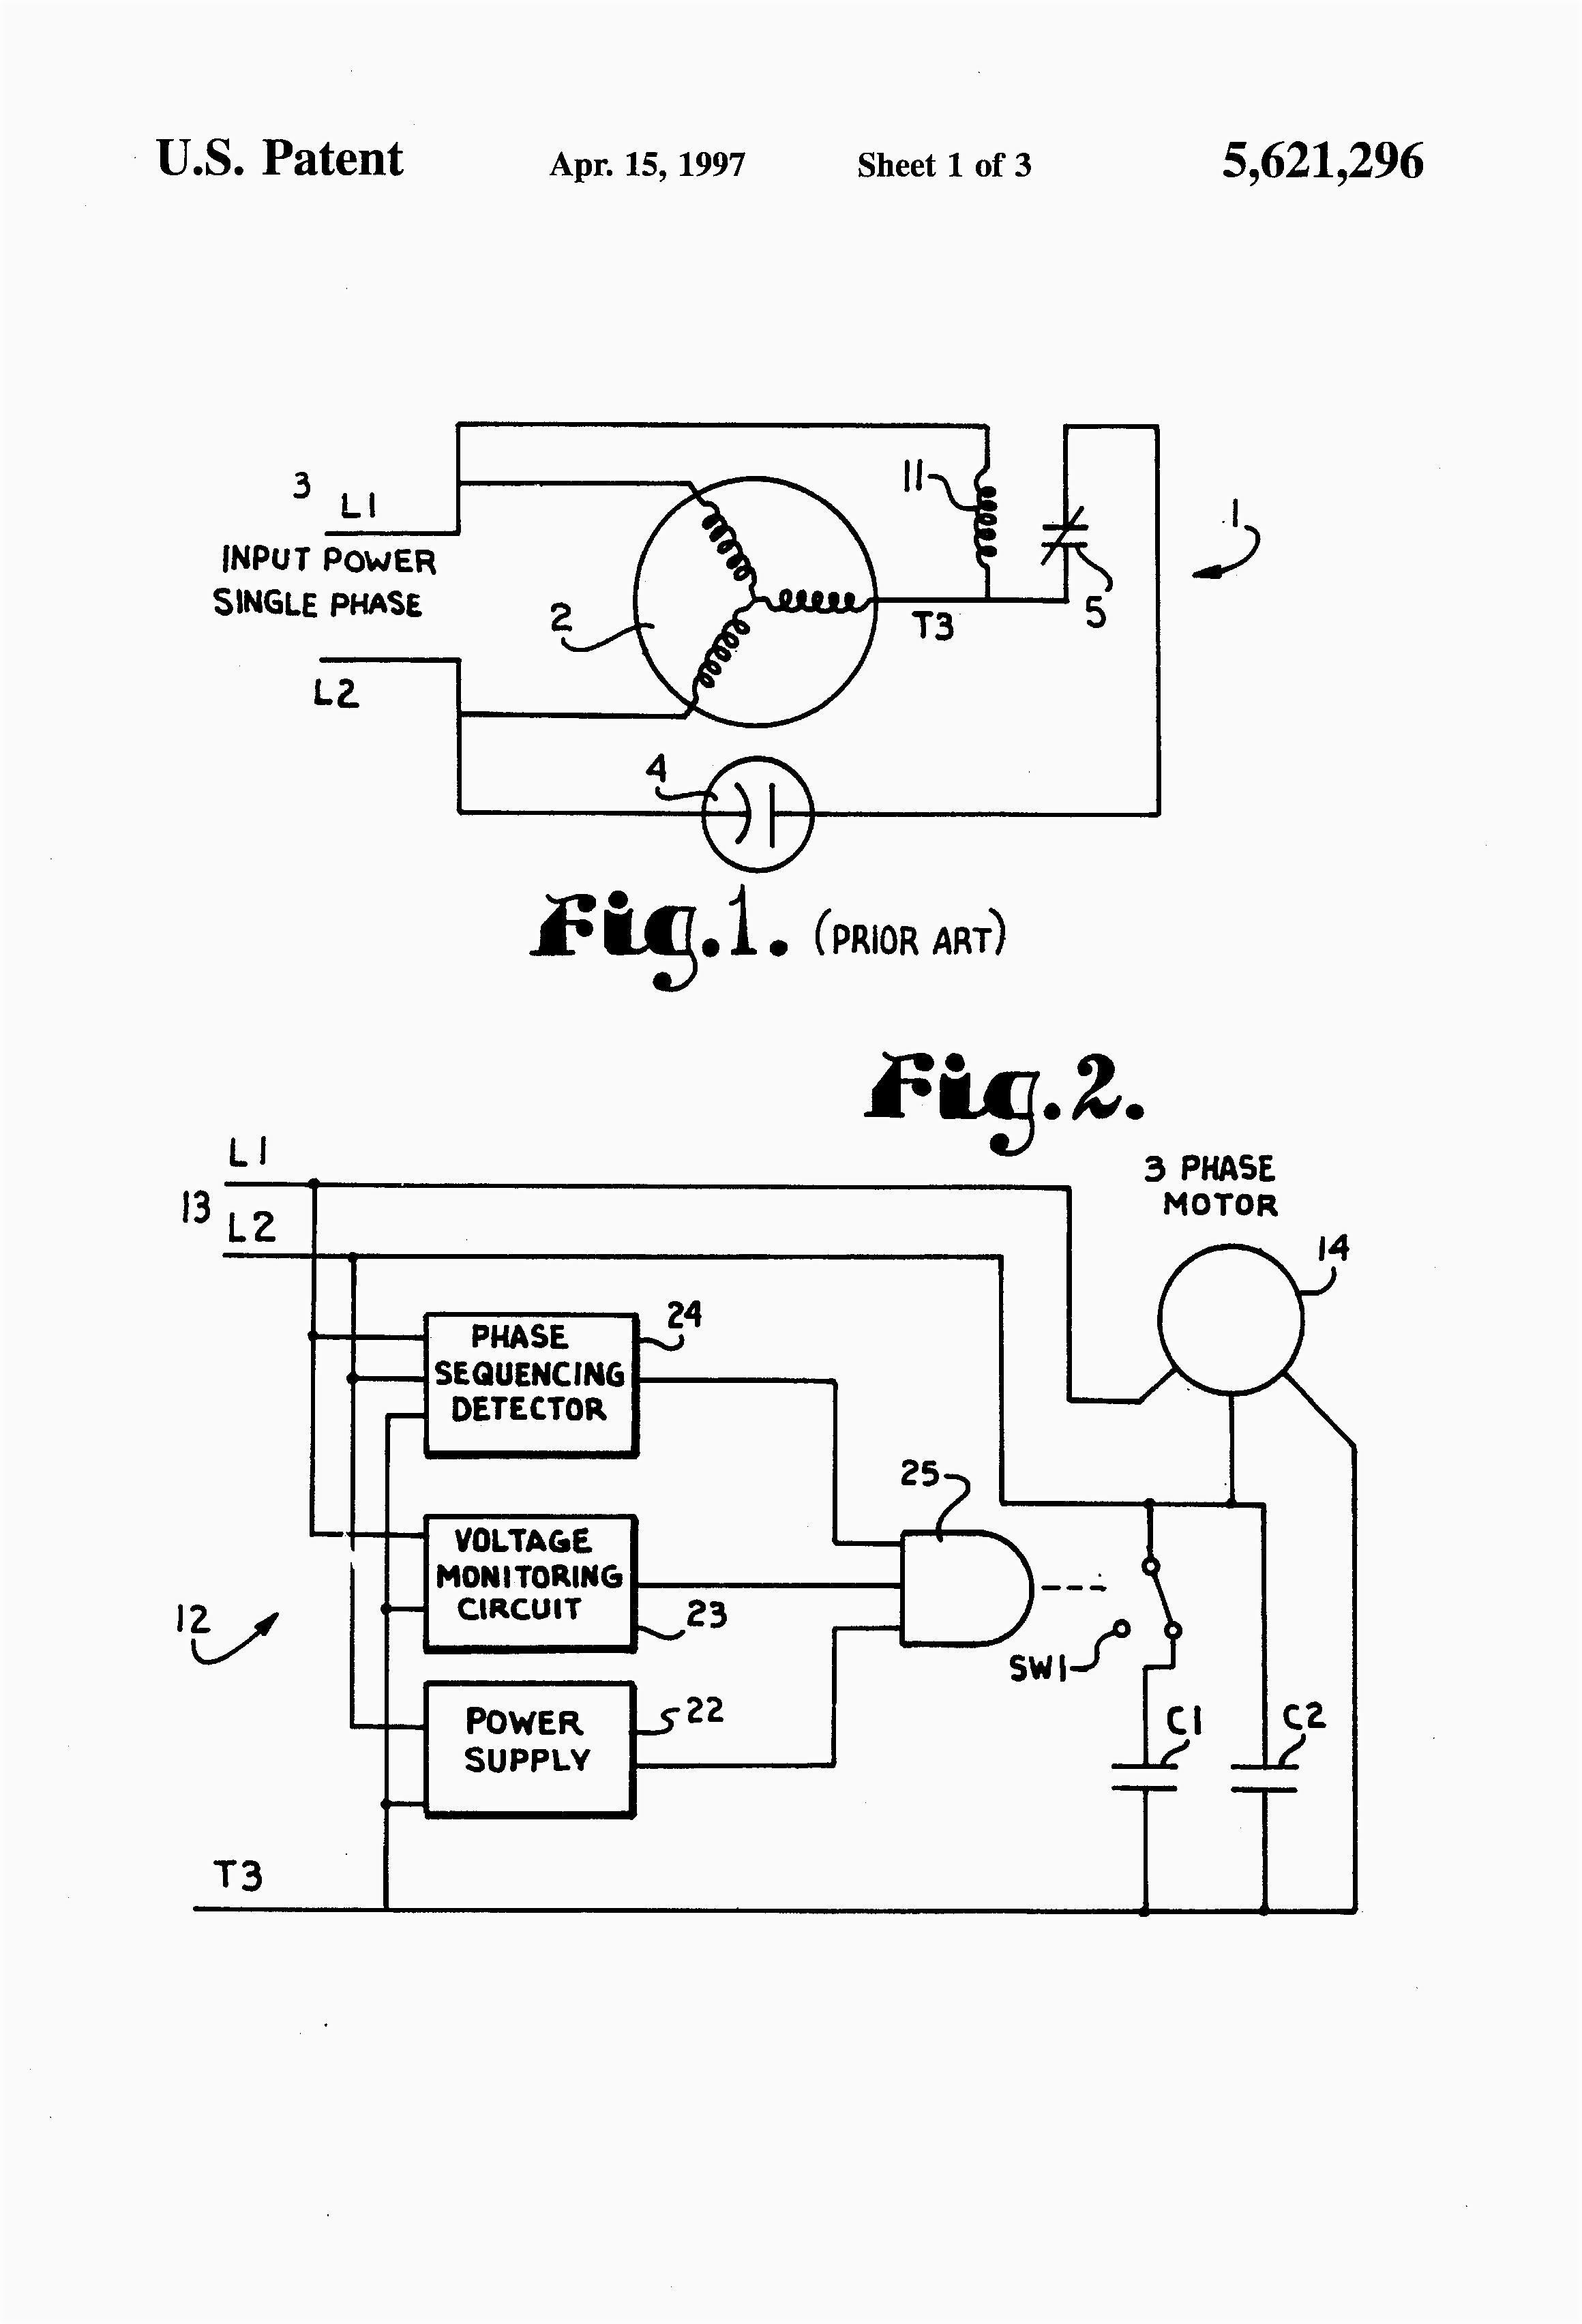 Phase Wiring Diagram L on l14-30p wiring diagram, electrical sub panel wiring diagram, l6-30 wiring diagram, l14-20p plug wiring diagram, bendix ec-30 wiring diagram, condensate pump wiring diagram, elixir power converter wiring diagram, 2006 nissan altima headlight wiring diagram, 10-50r wiring diagram, 30 amp twist lock plug wiring diagram, nema 14 50 wiring diagram, 3 prong plug wiring diagram, electric dryer plug wiring diagram, l15-30 3 phase wiring diagram, hot rod wiring diagram, l14-30r wiring diagram, 30 amp rv wiring diagram, nema 14 30 wiring diagram, l5-20 wiring diagram, generator plug wiring diagram,